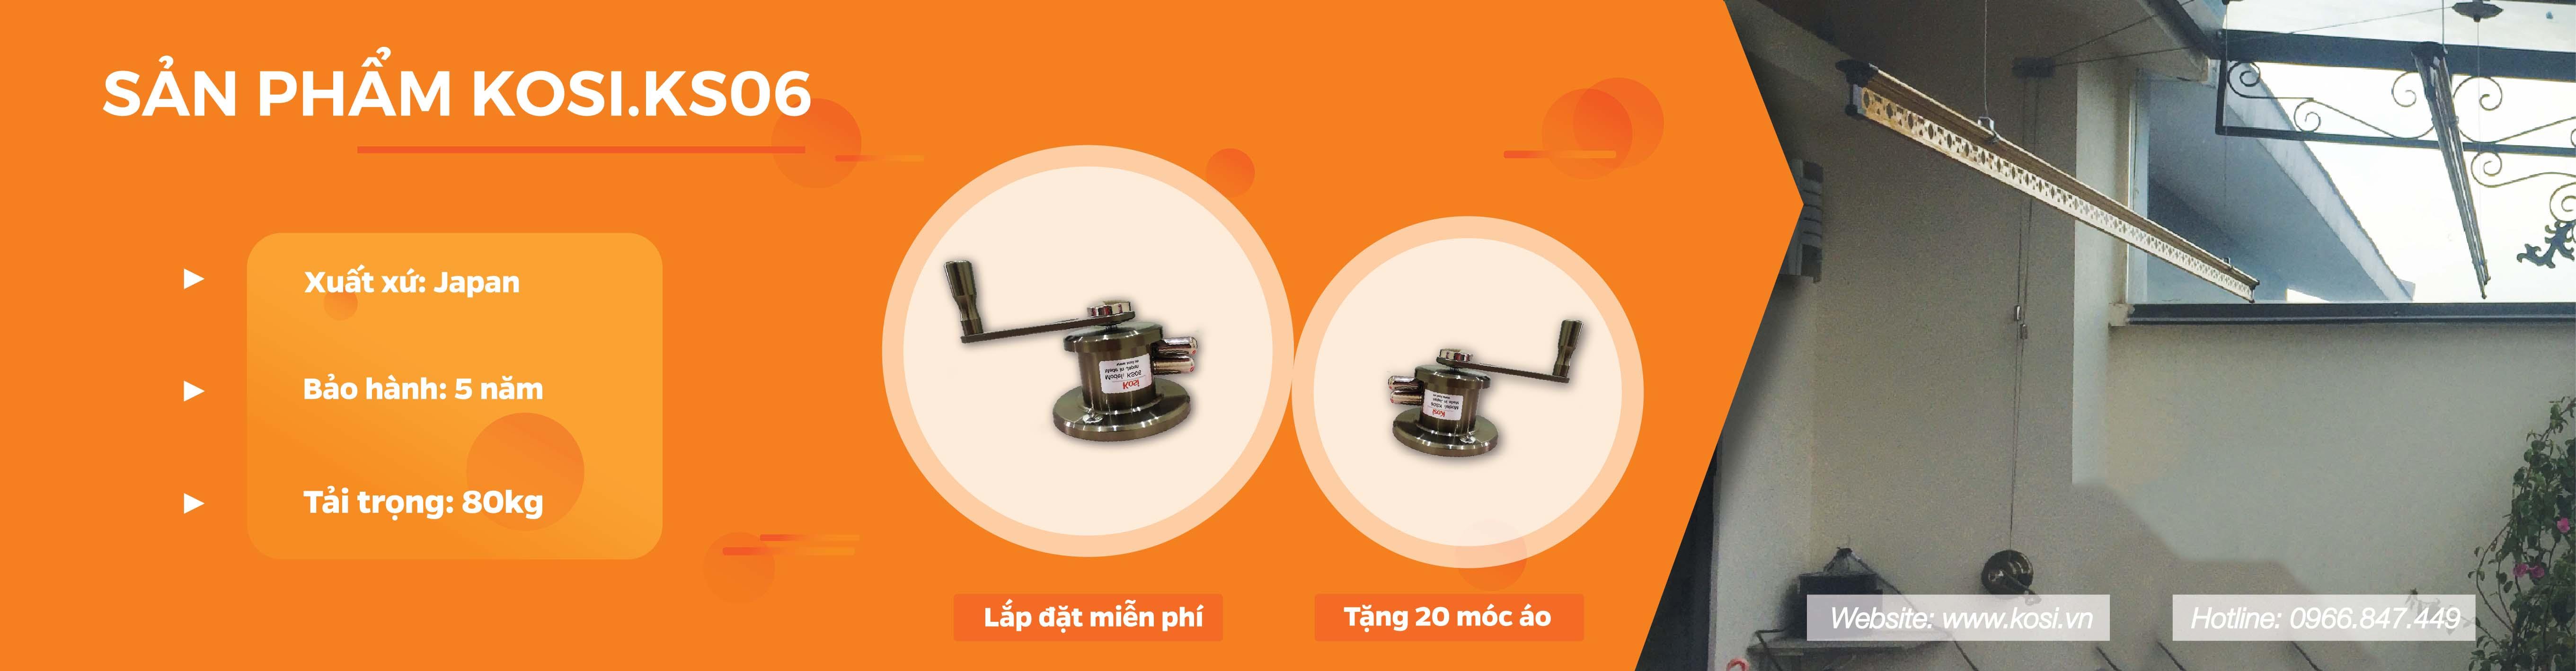 gian-phoi-thong-minh-kosi-ks-06